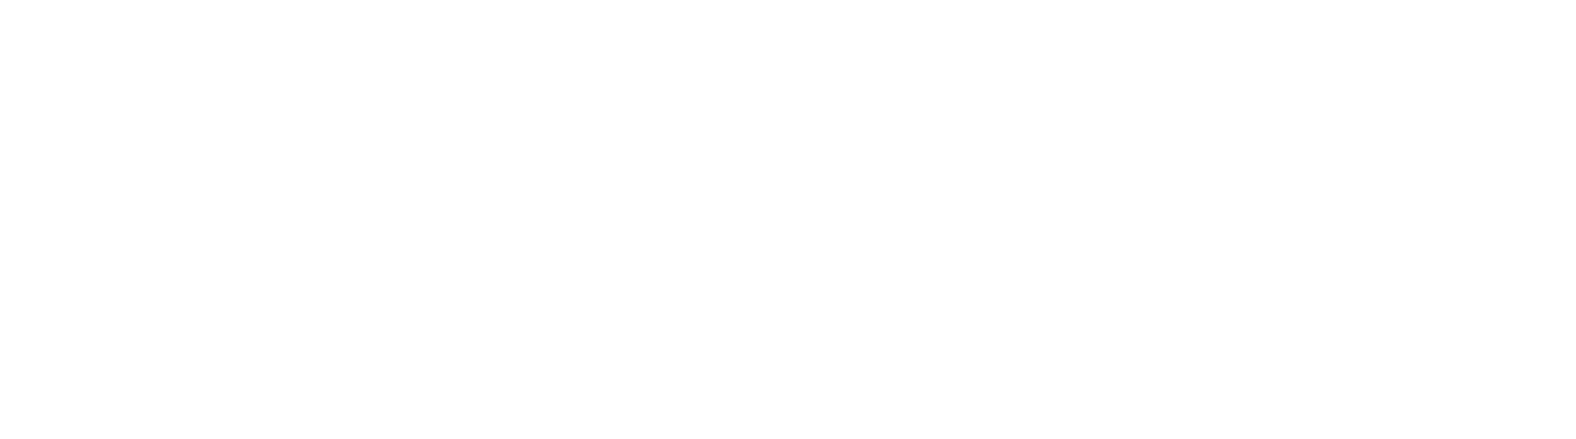 Vacu-Man